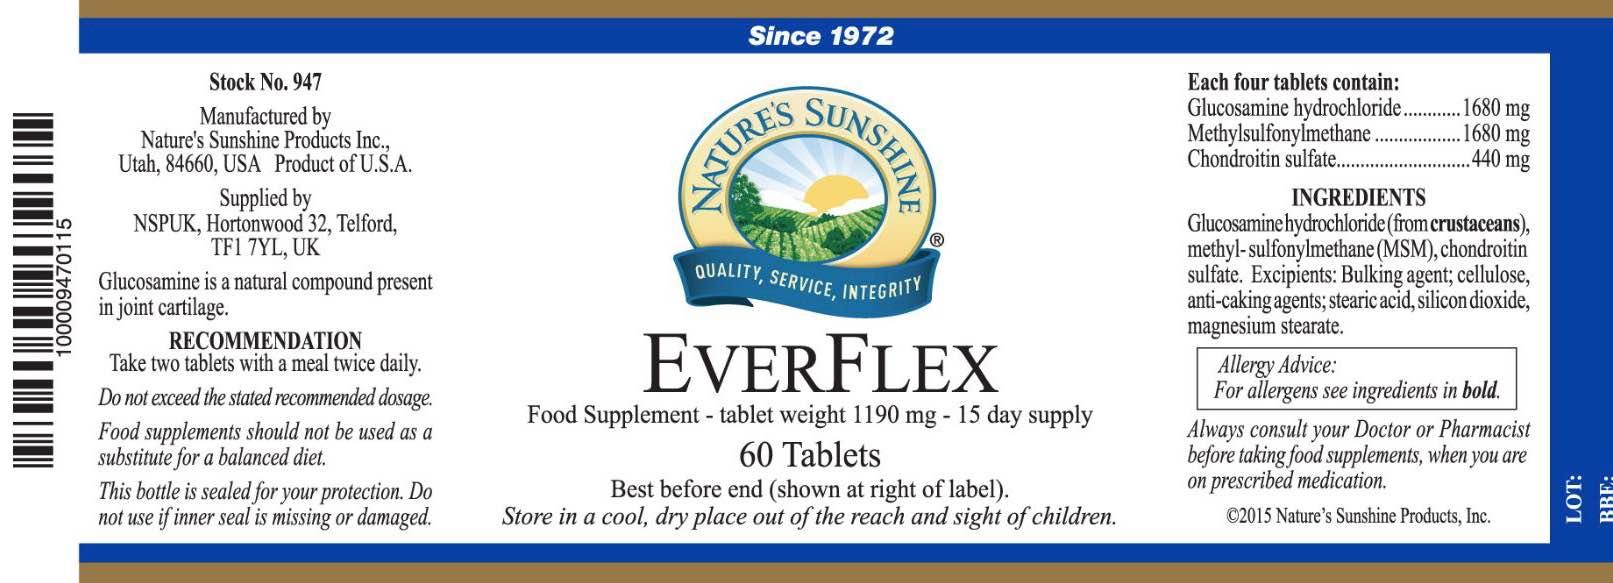 Nature's Sunshine - EverFlex - Label